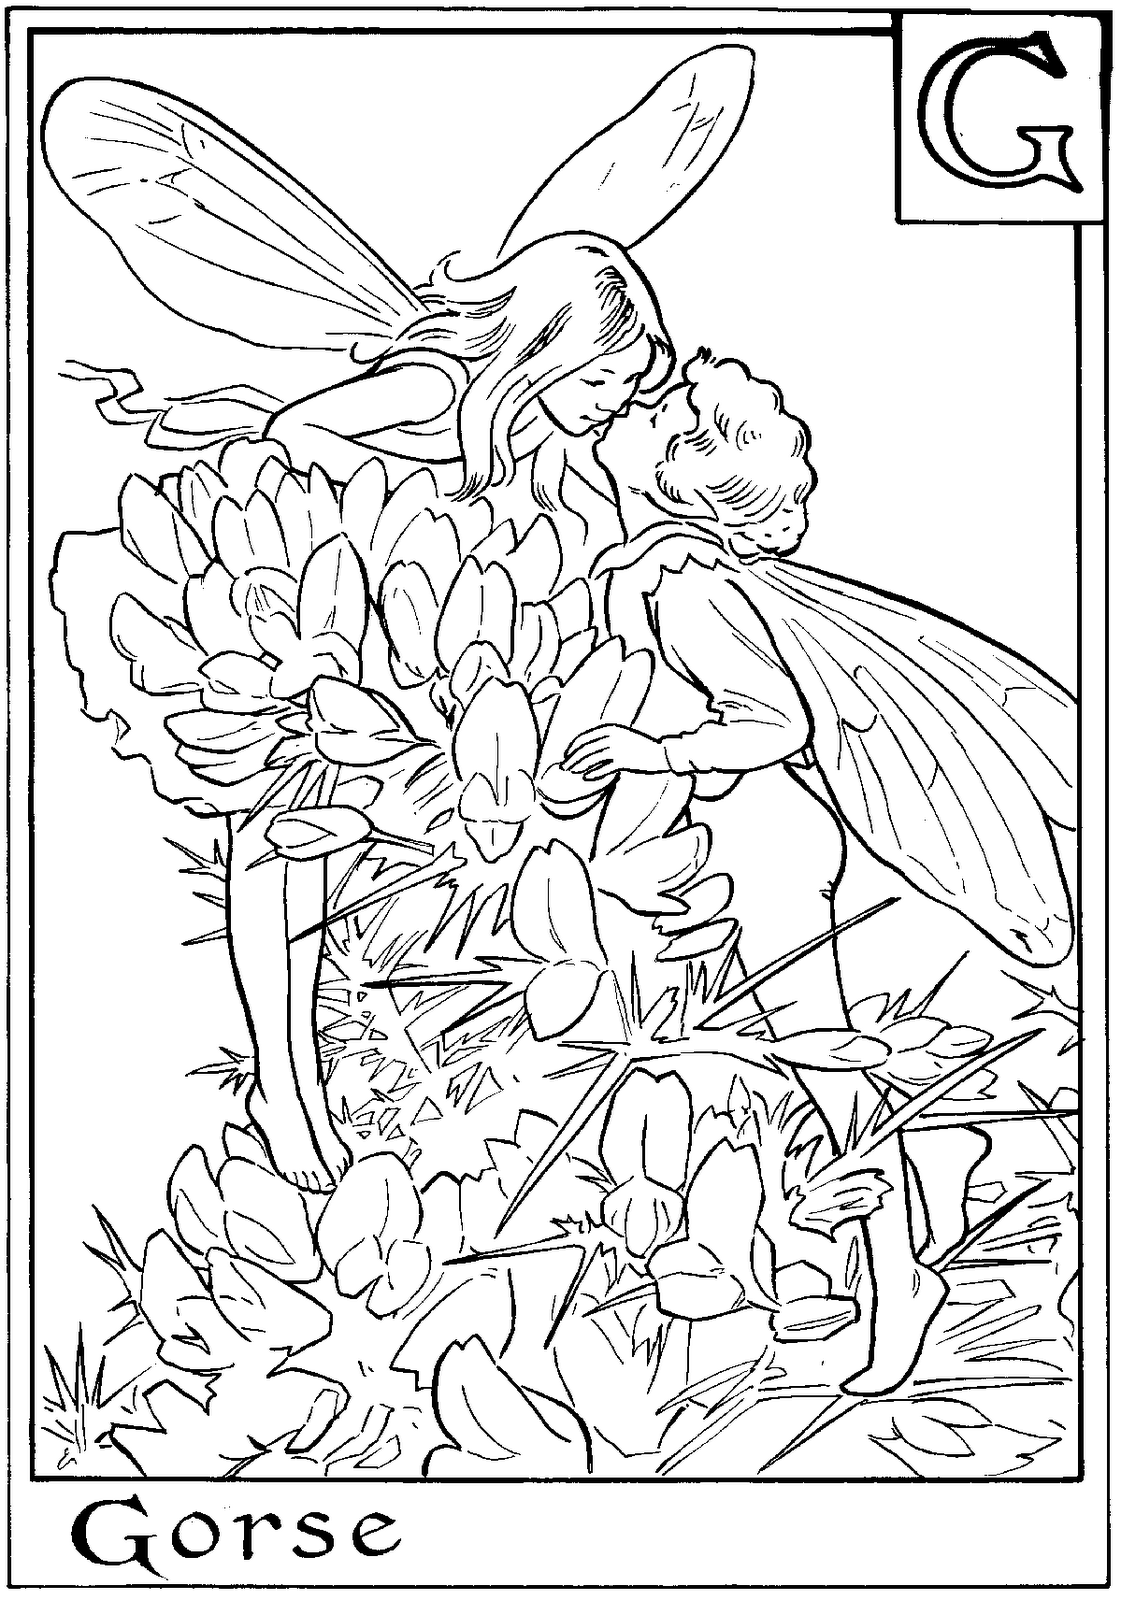 Alvarium Nostrum K 246 Nyvkapt 225 R T 220 Nd 201 Rek And The Island Princess Coloring Pages